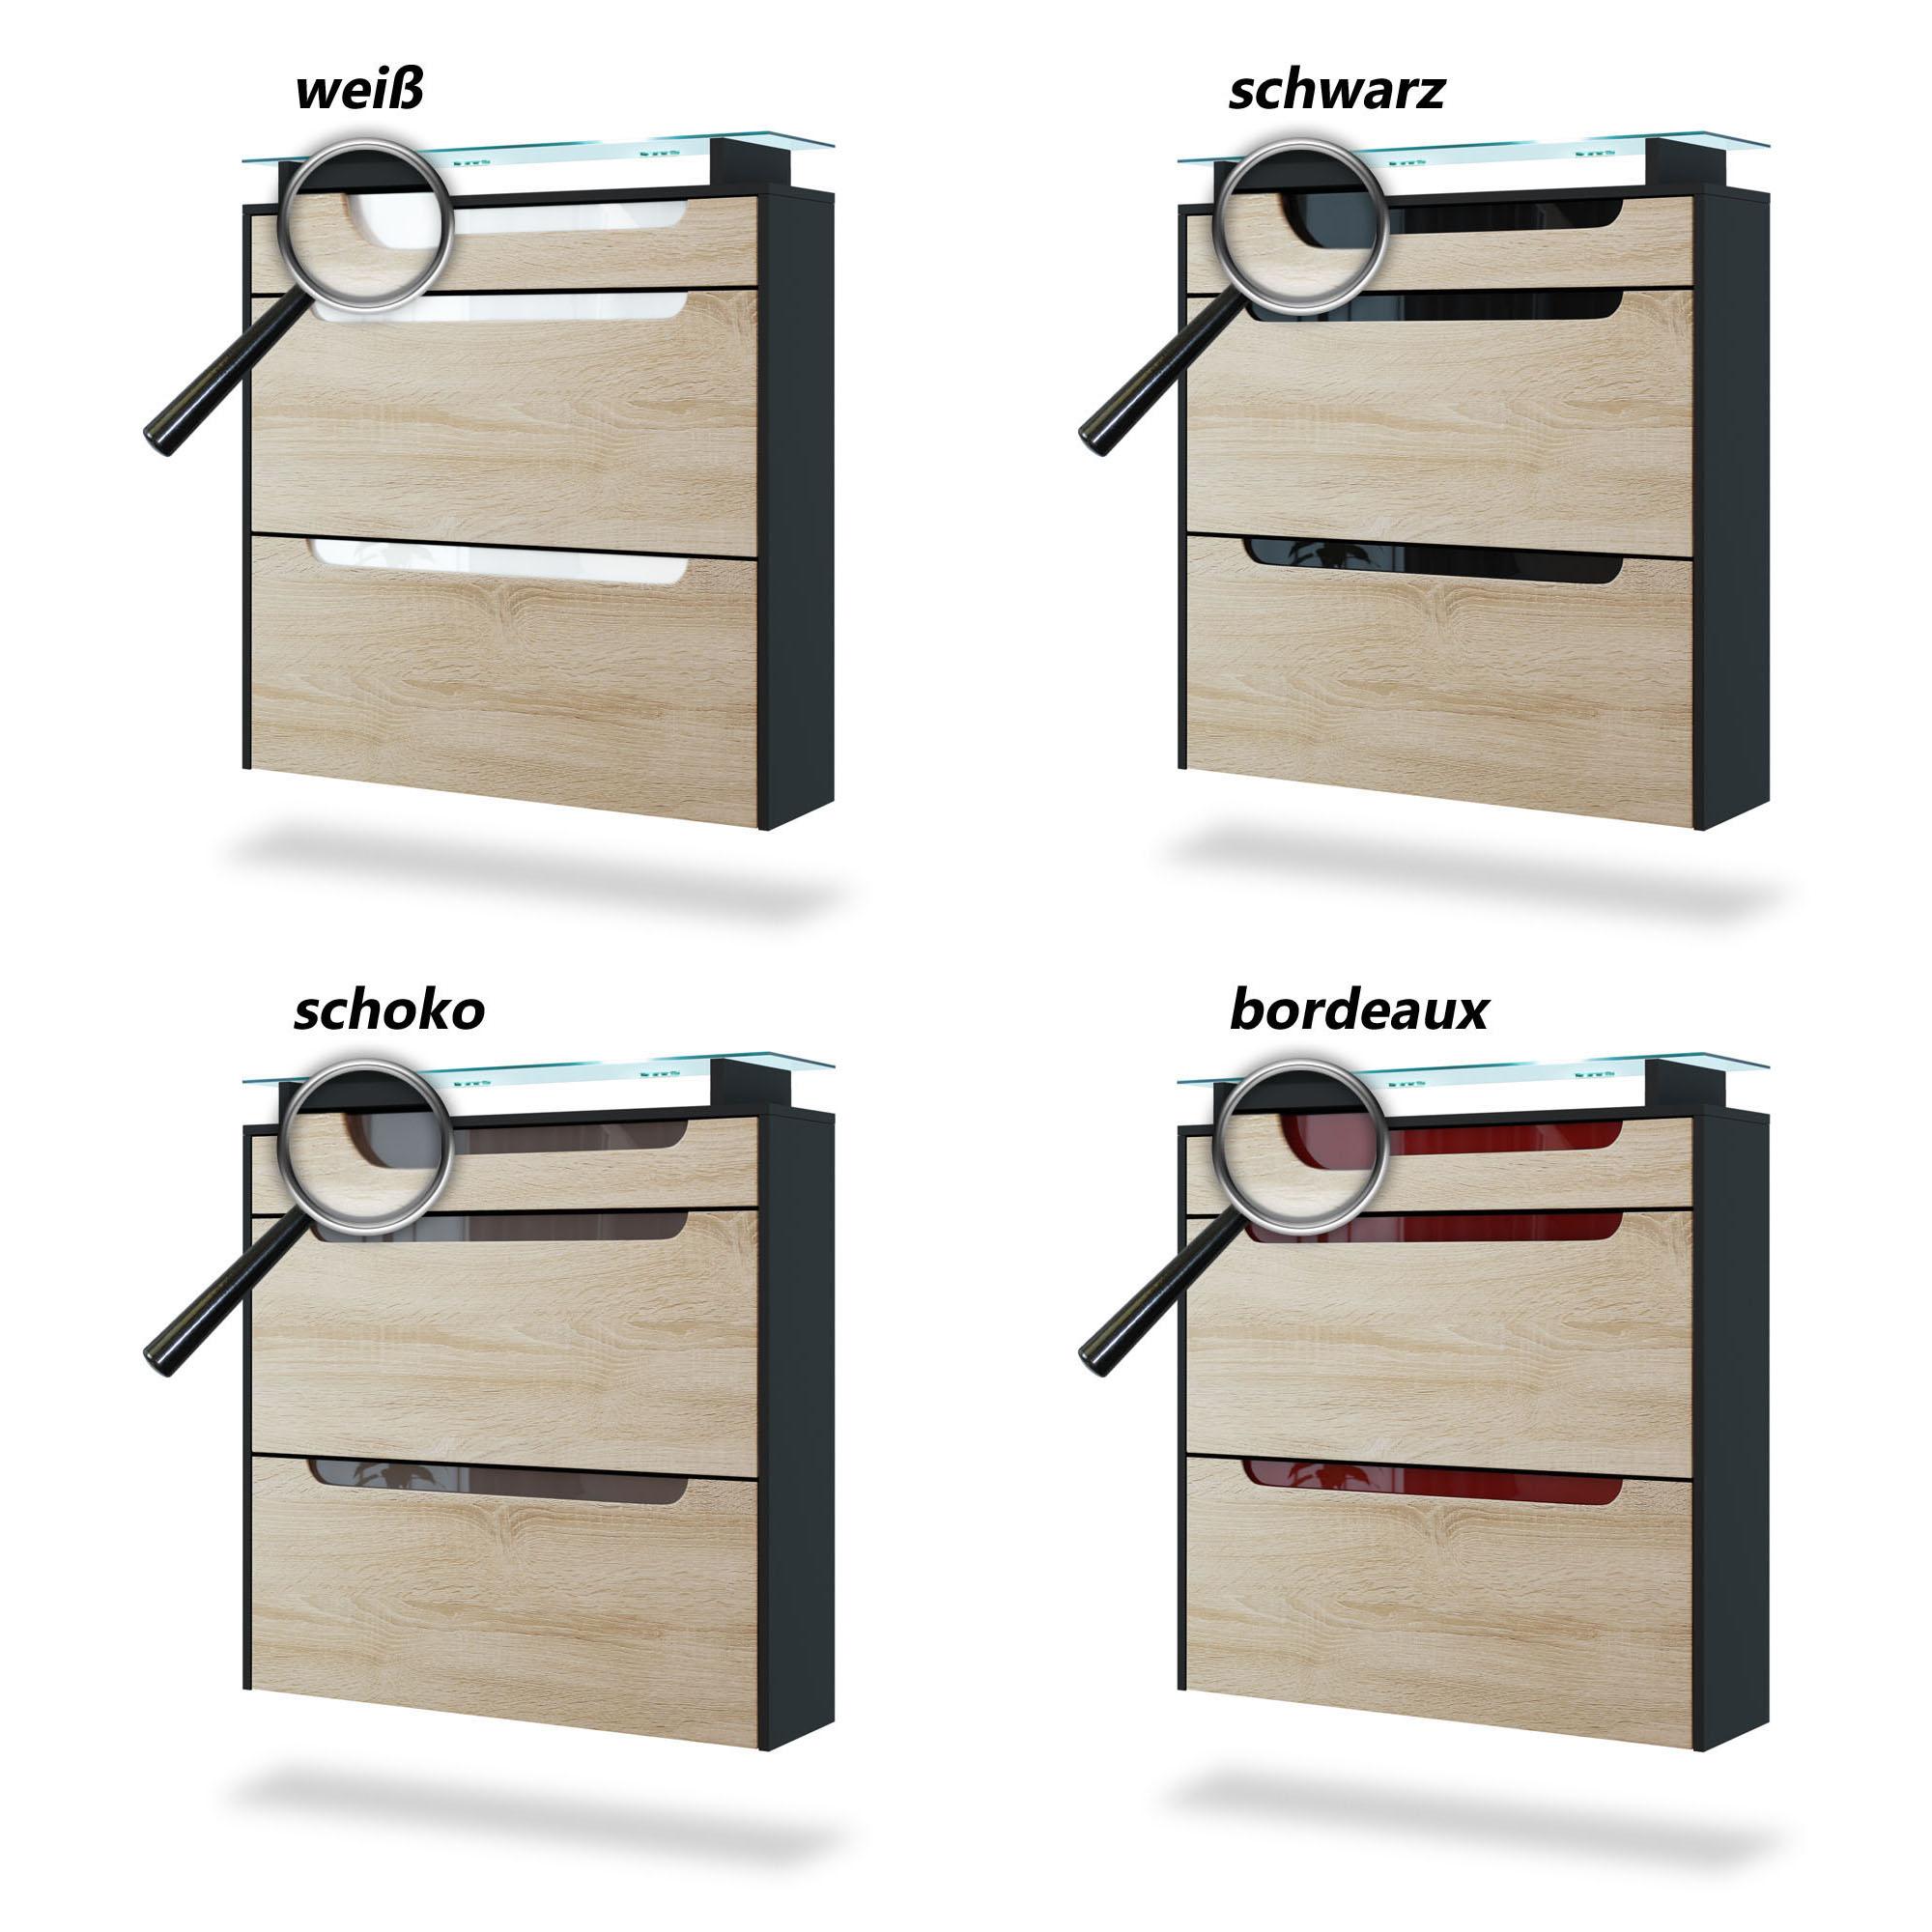 schuhschrank schuhkipper schuh regal h nge flur schrank. Black Bedroom Furniture Sets. Home Design Ideas